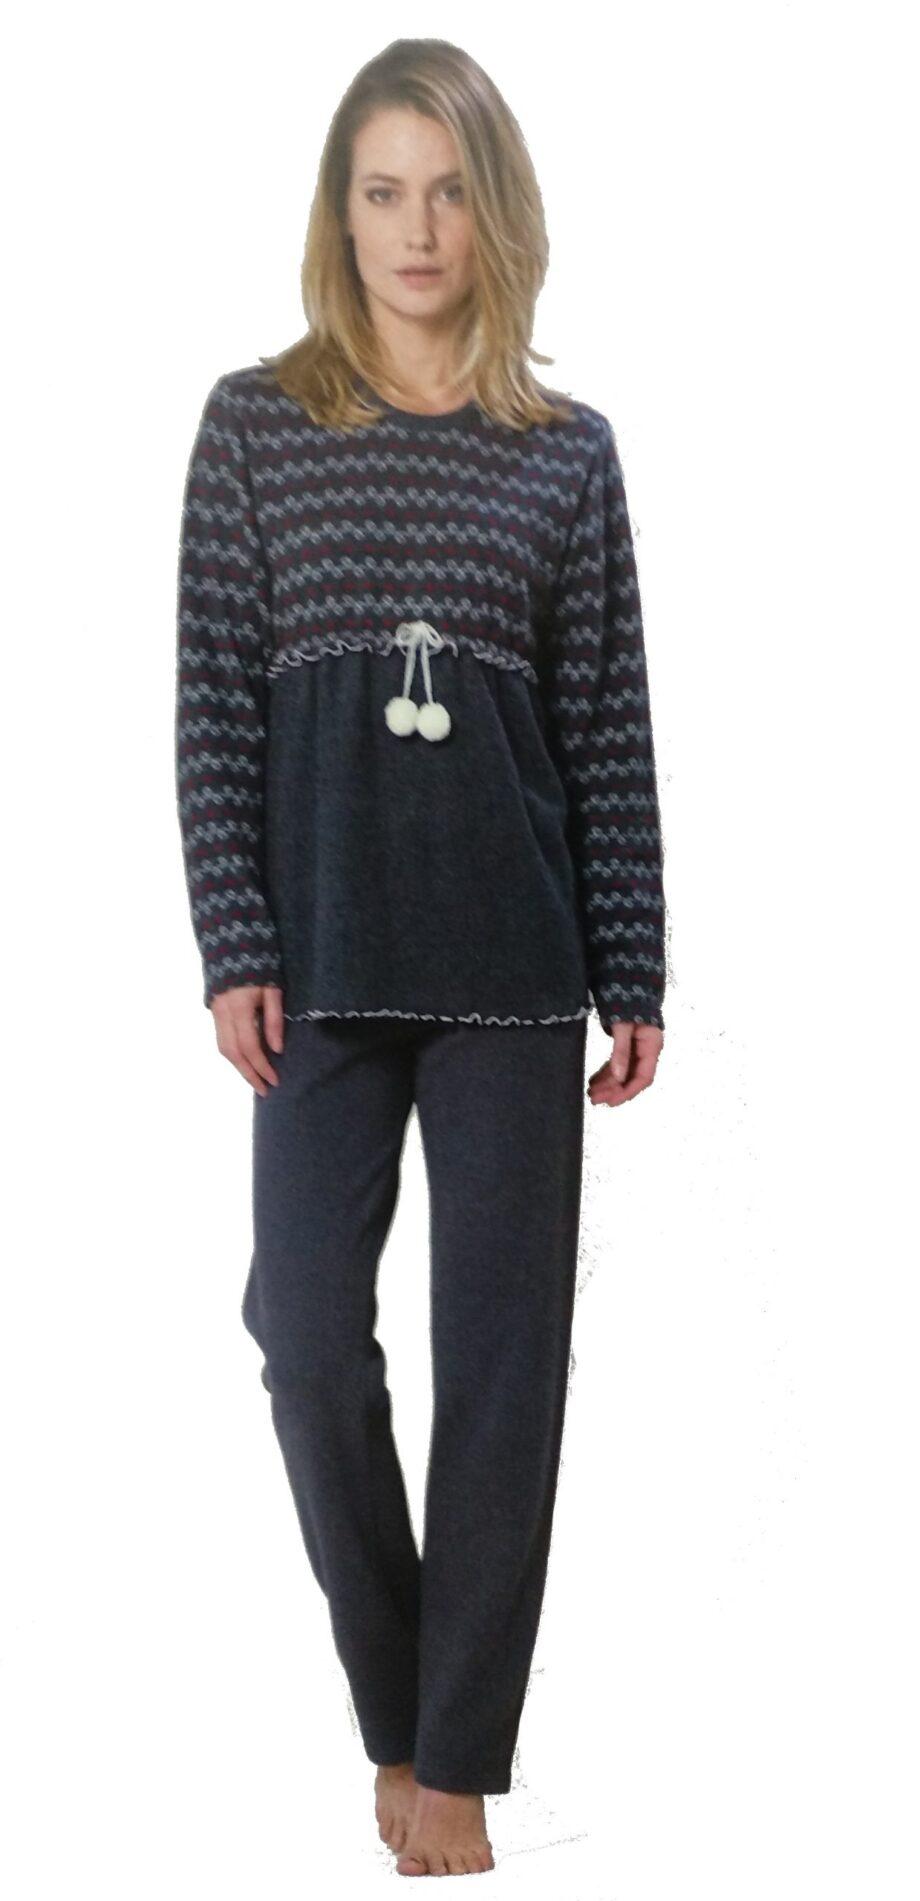 amica-pijama-fleece-92A805-scaled-1.jpeg